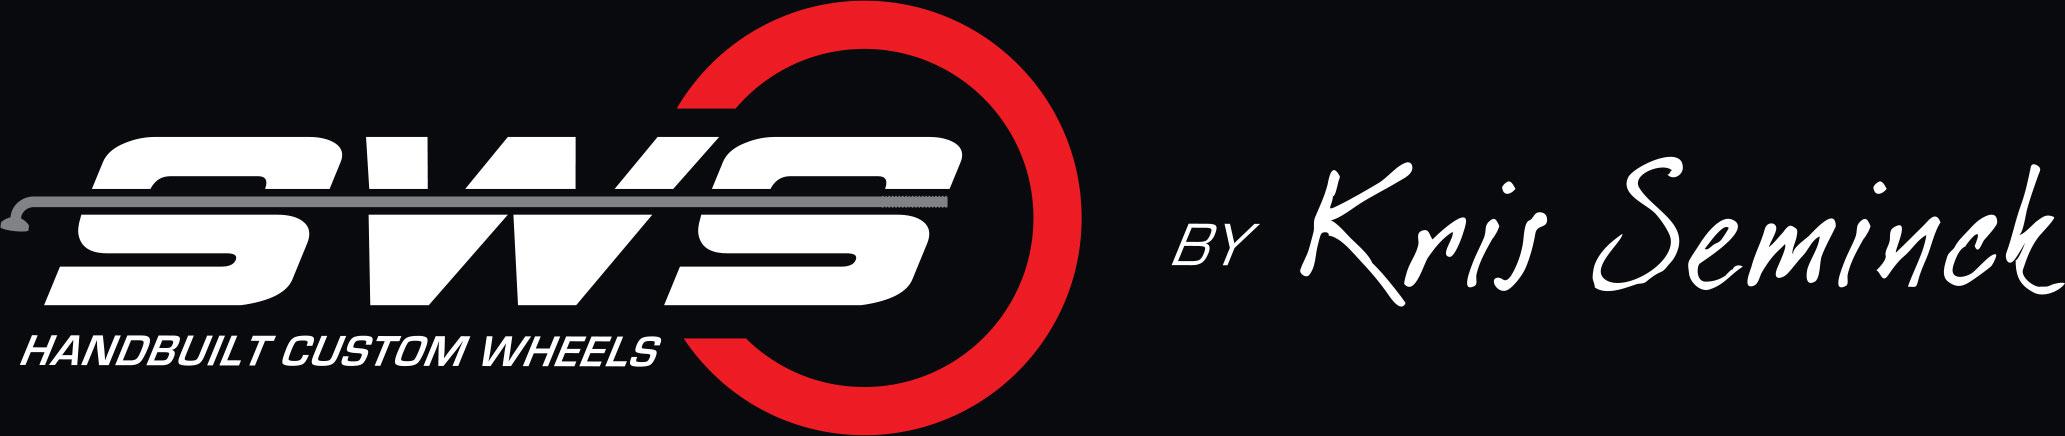 sws_logo_2014_by_krisseminck_opzwart